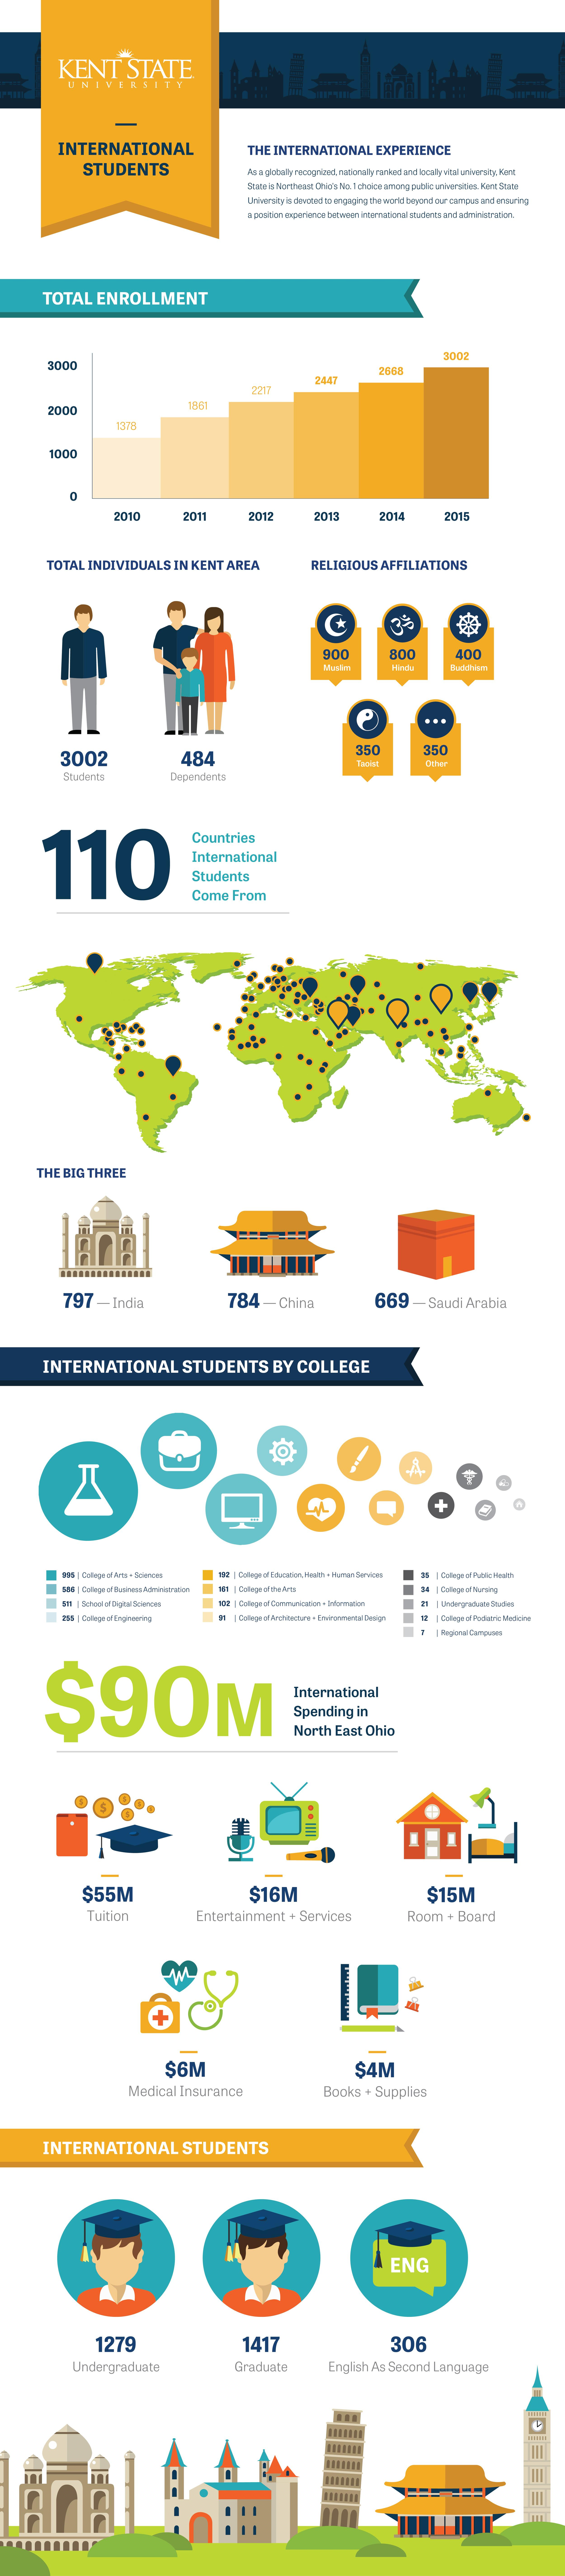 Infographic-06.jpg